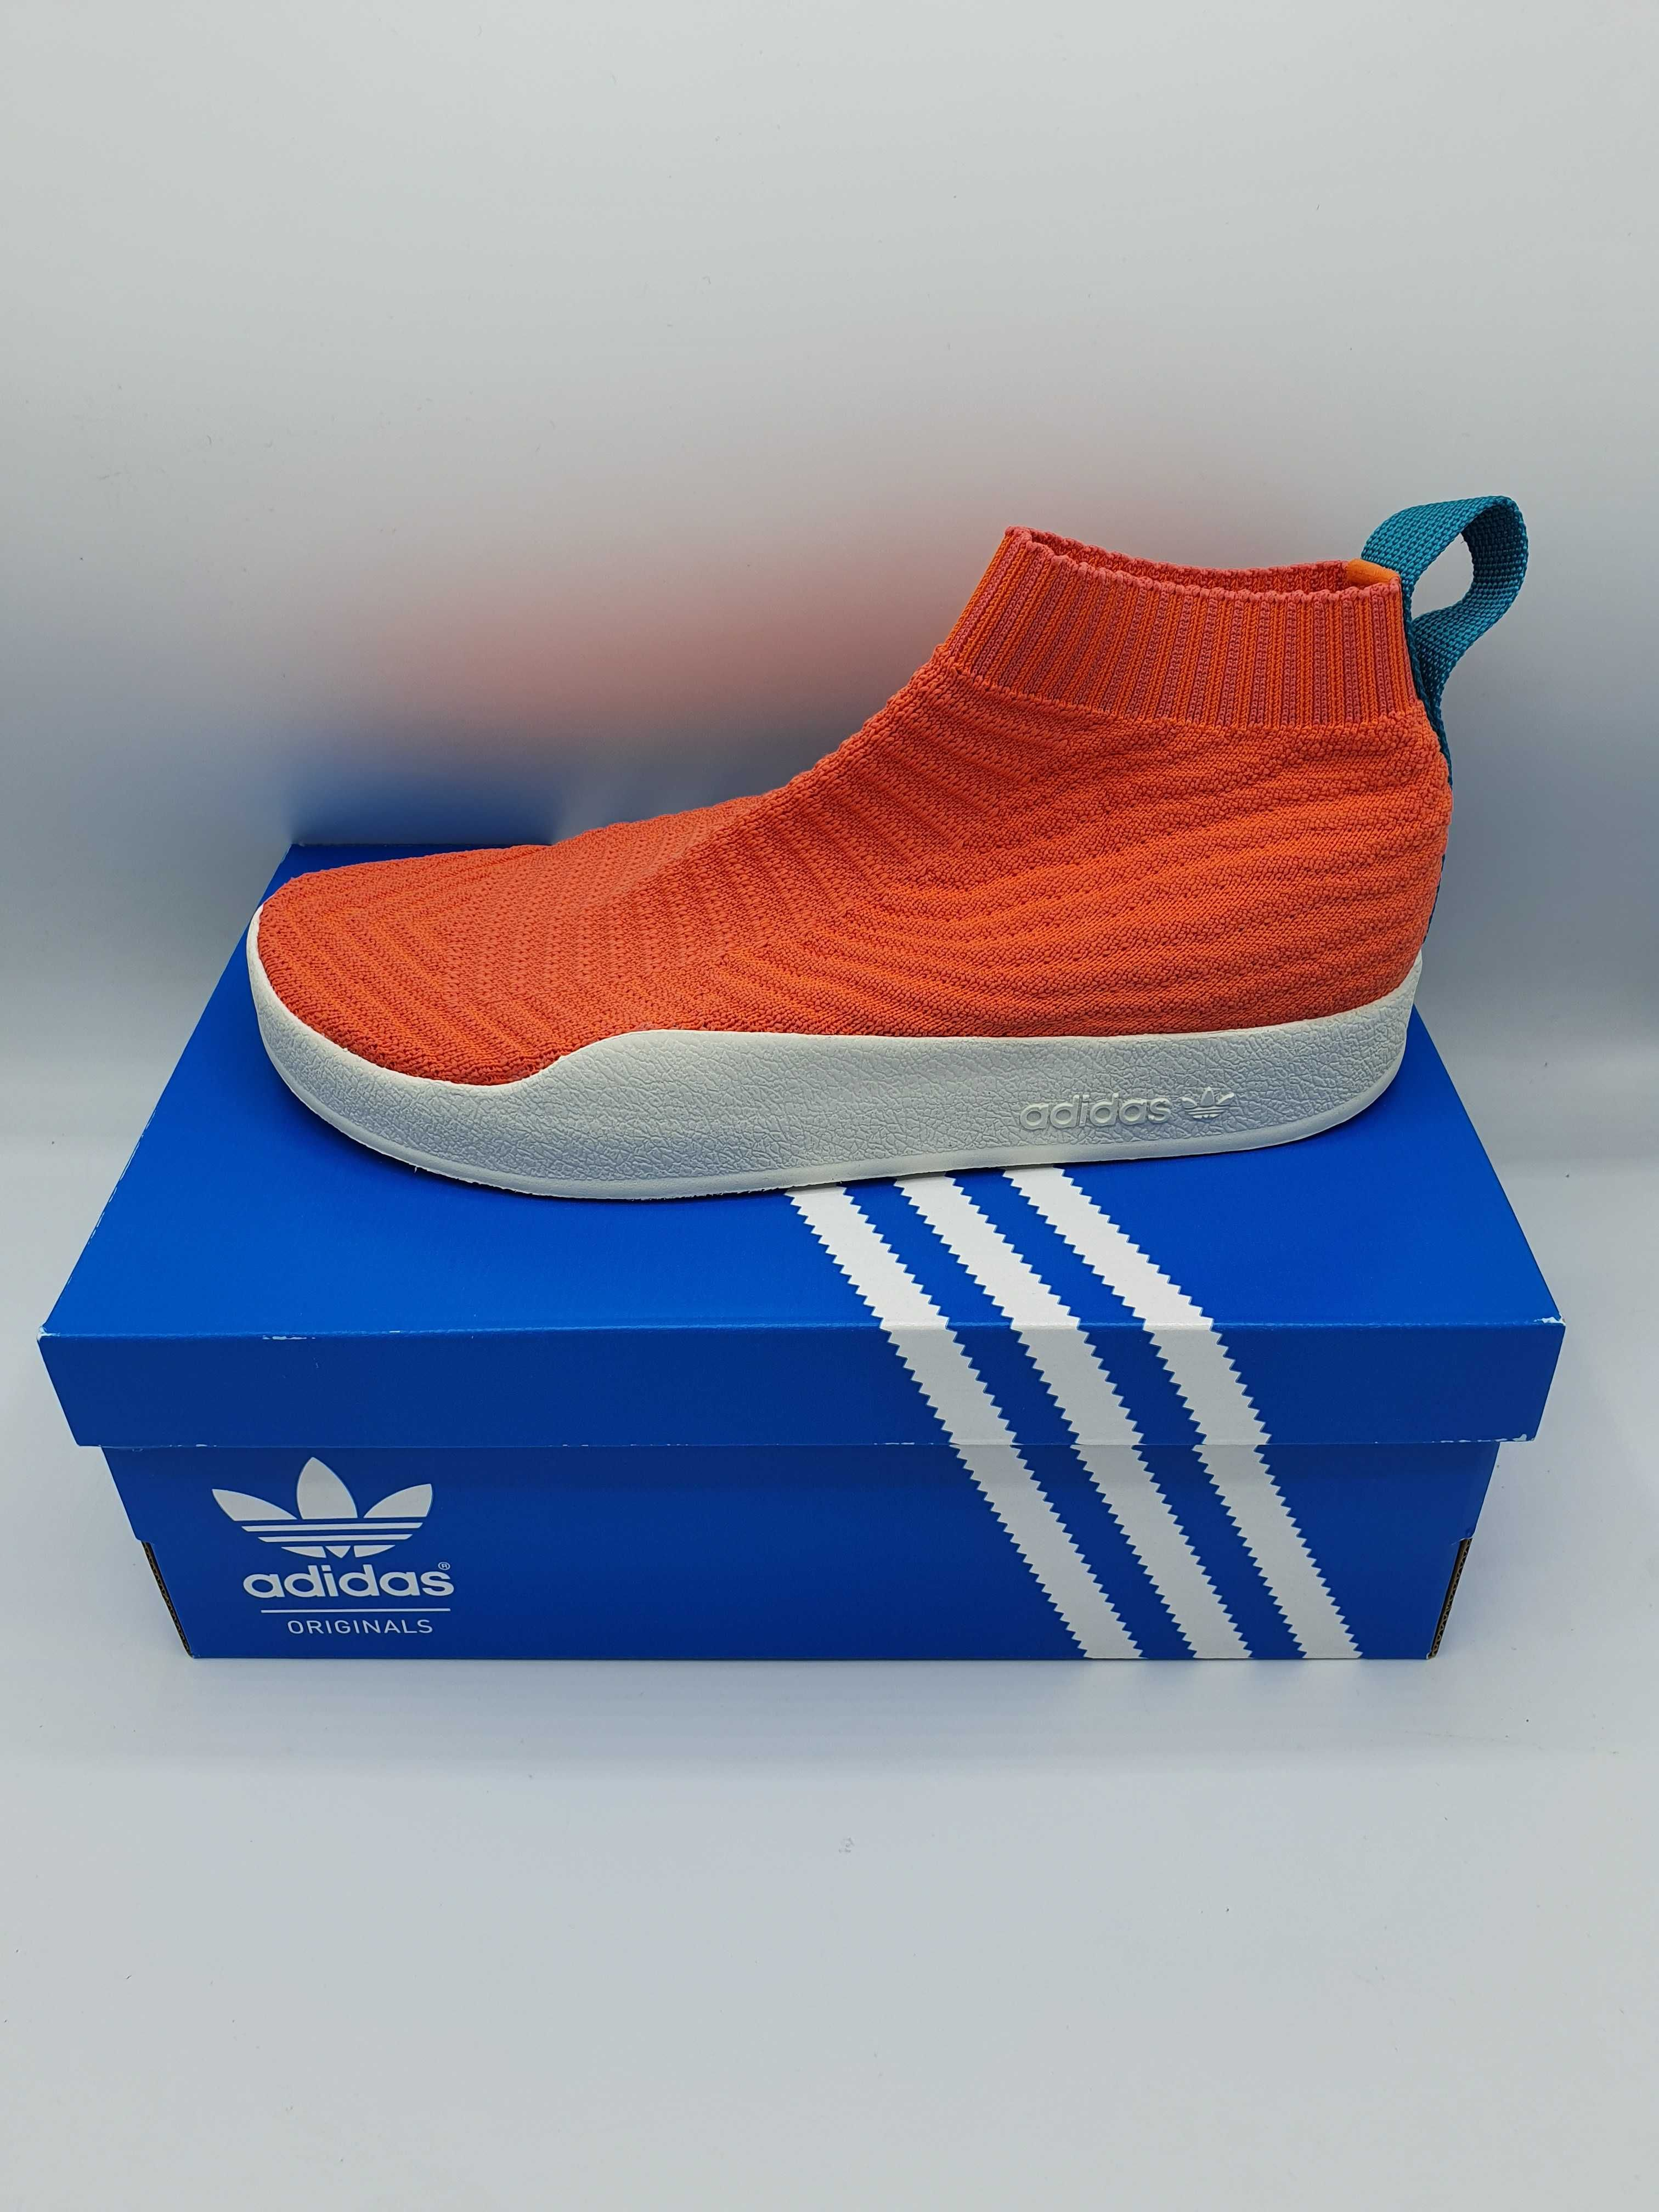 Adidasi Adidas Originals Adilette Primeknit Sock